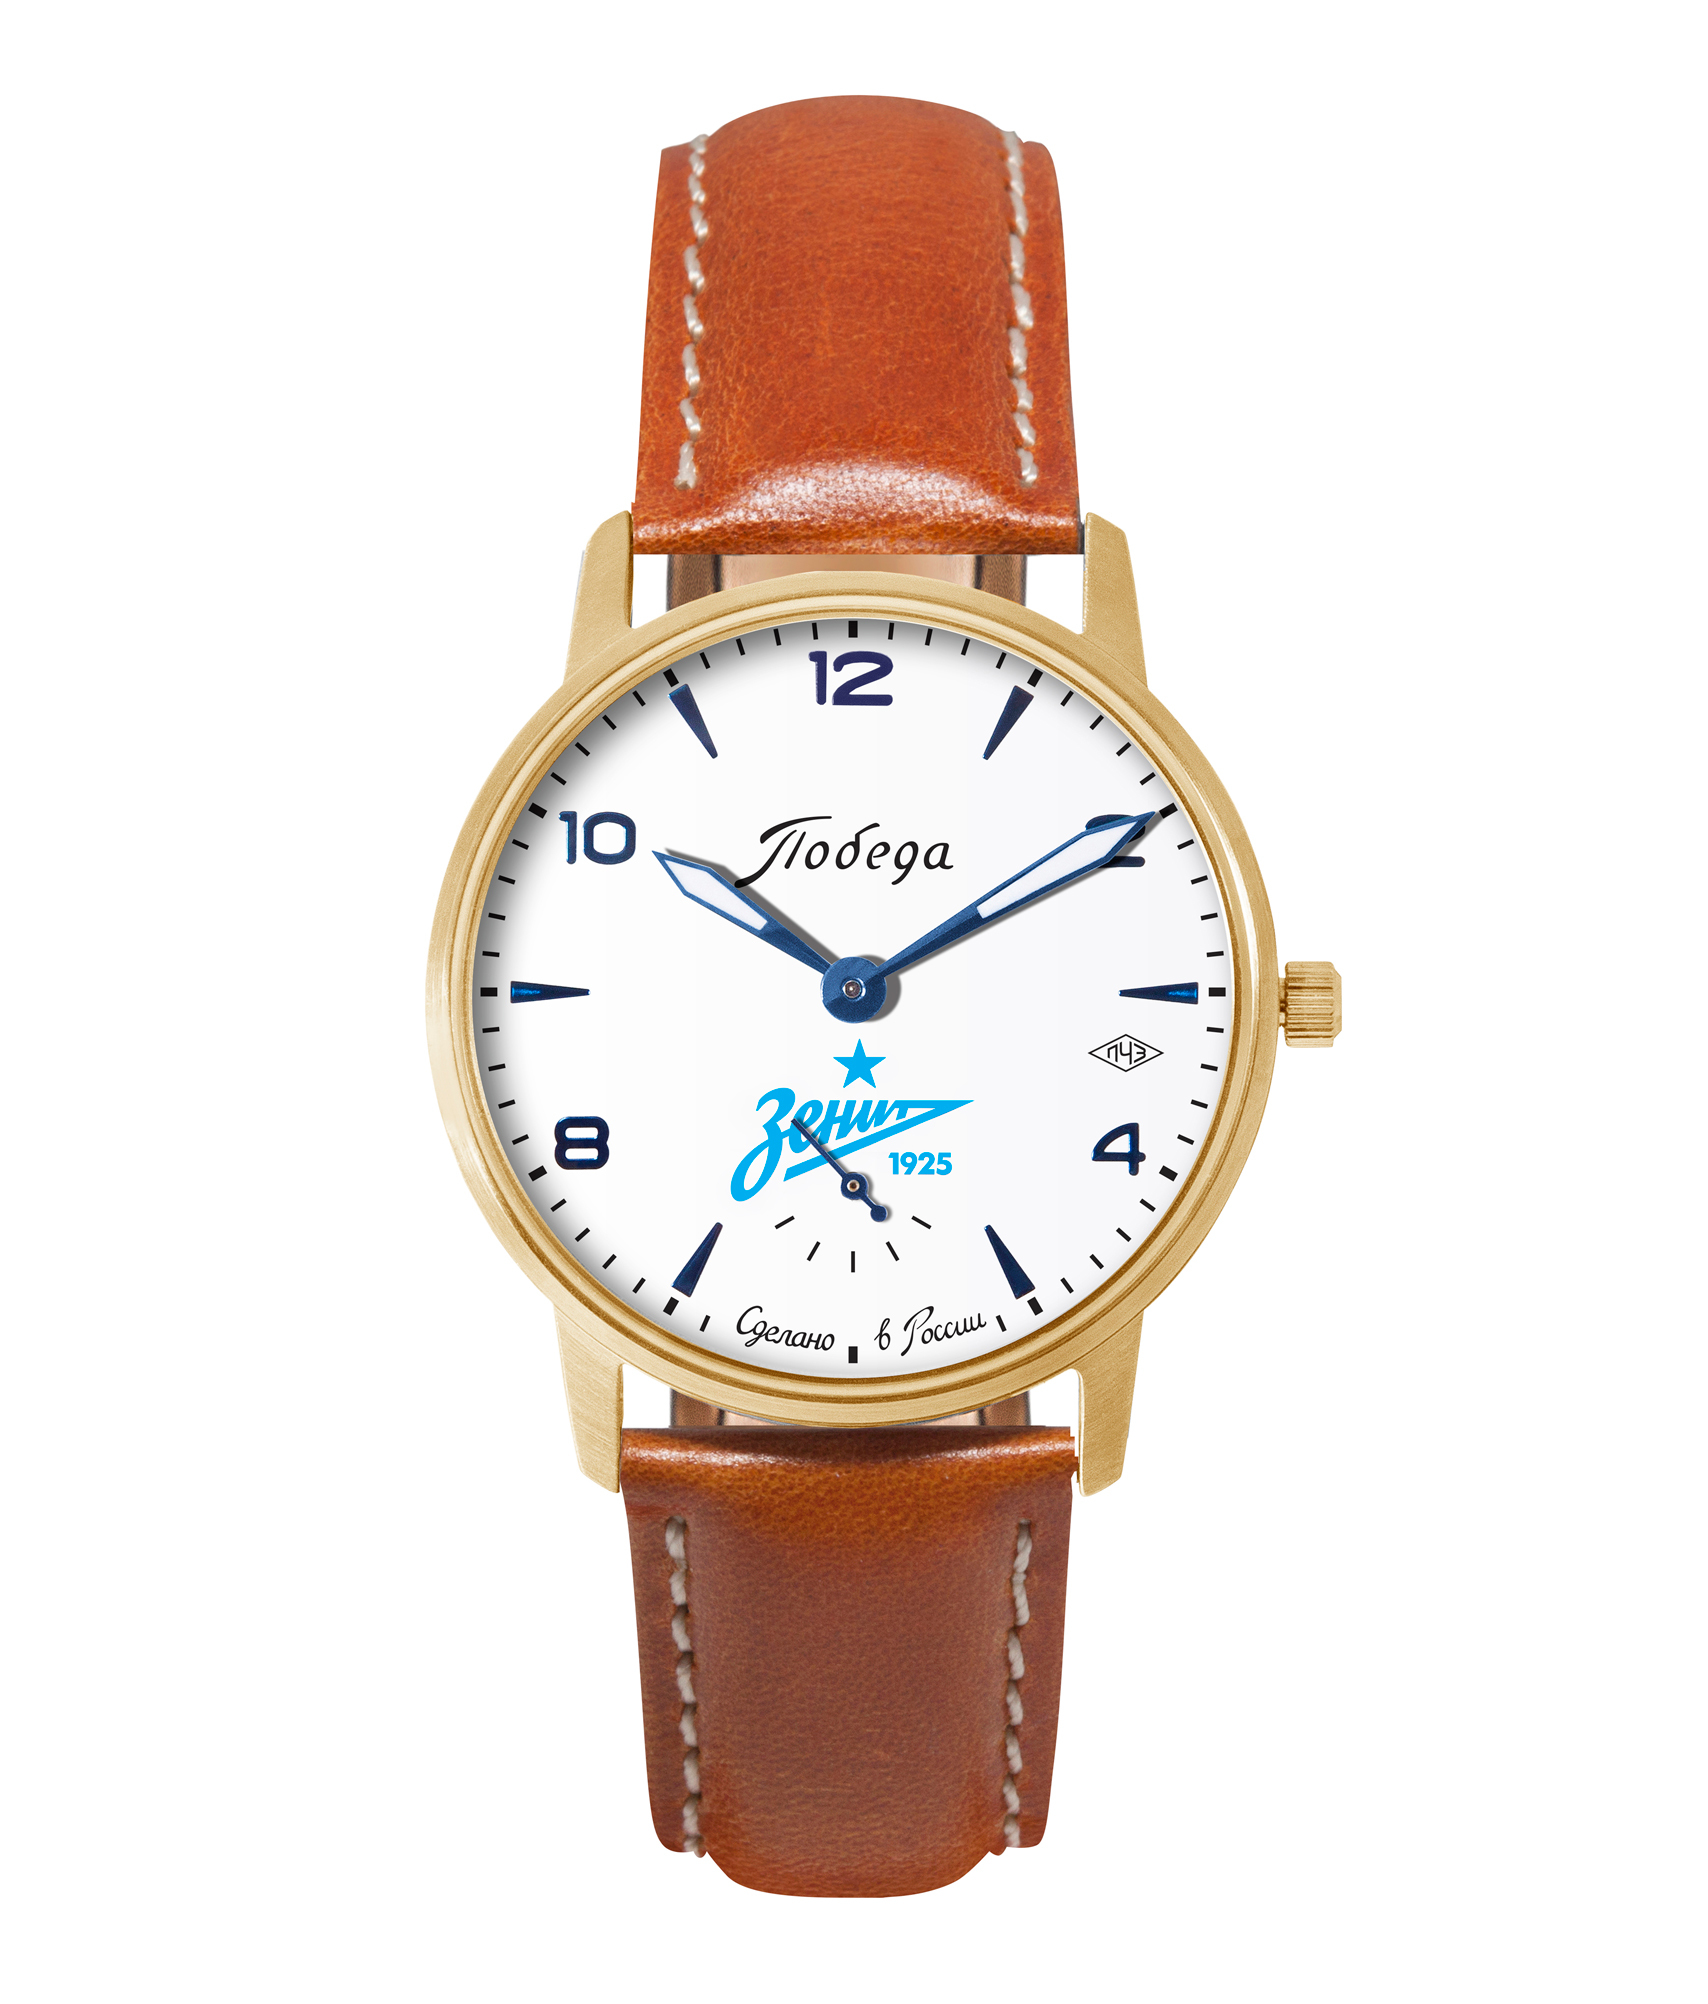 Часы «Победа» часы победа 1946 год г москва цены фото